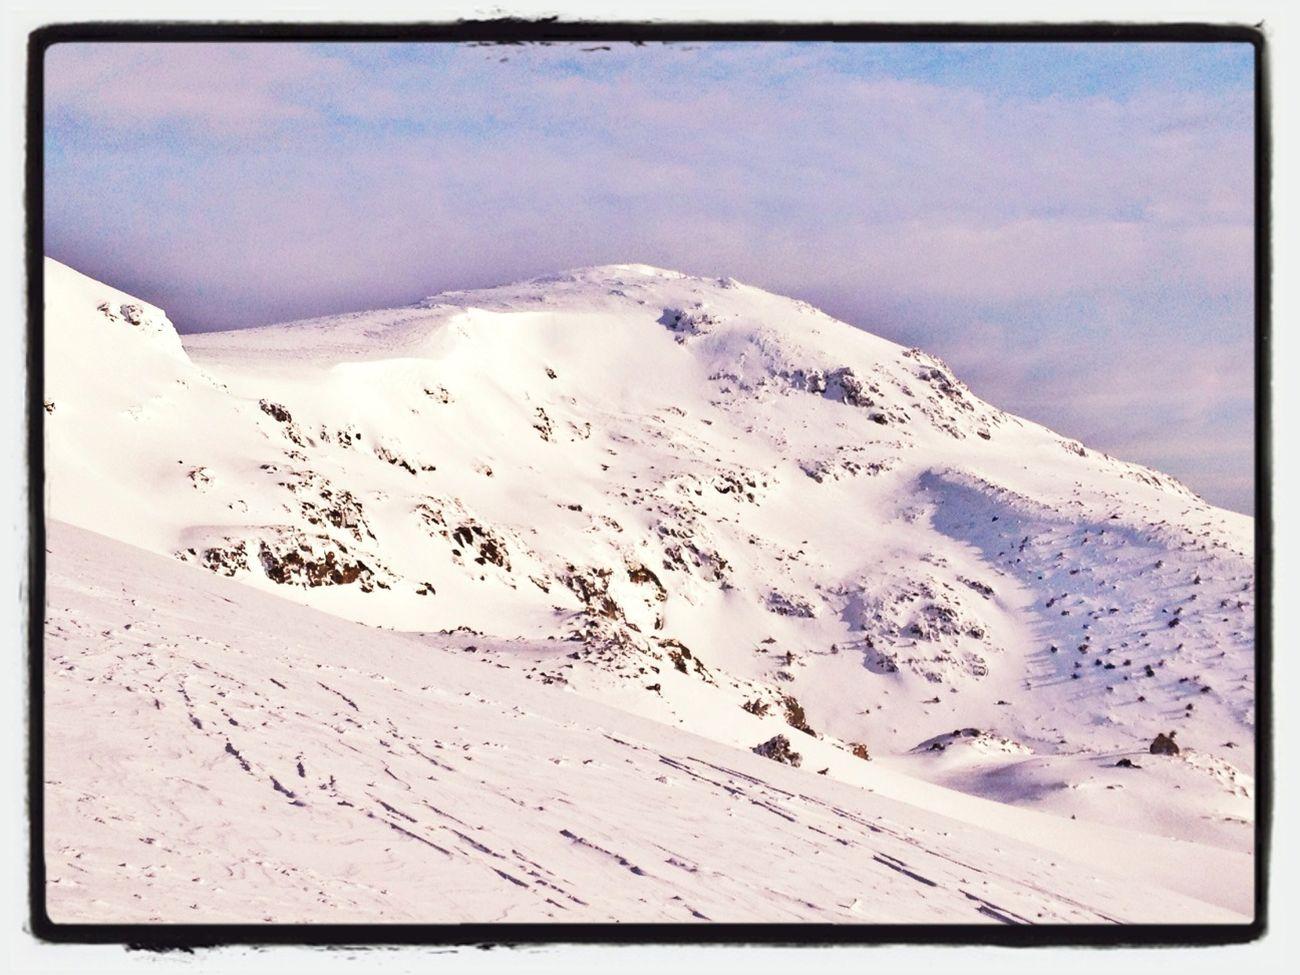 Muchos Objetivos En Esas Laderas De Peñalara  #esquídemontaña #skimountaineering #skimo #training #sunrise #amanecer #cotos #peñalara #gasss #dynafit #mountain #ilovemountain